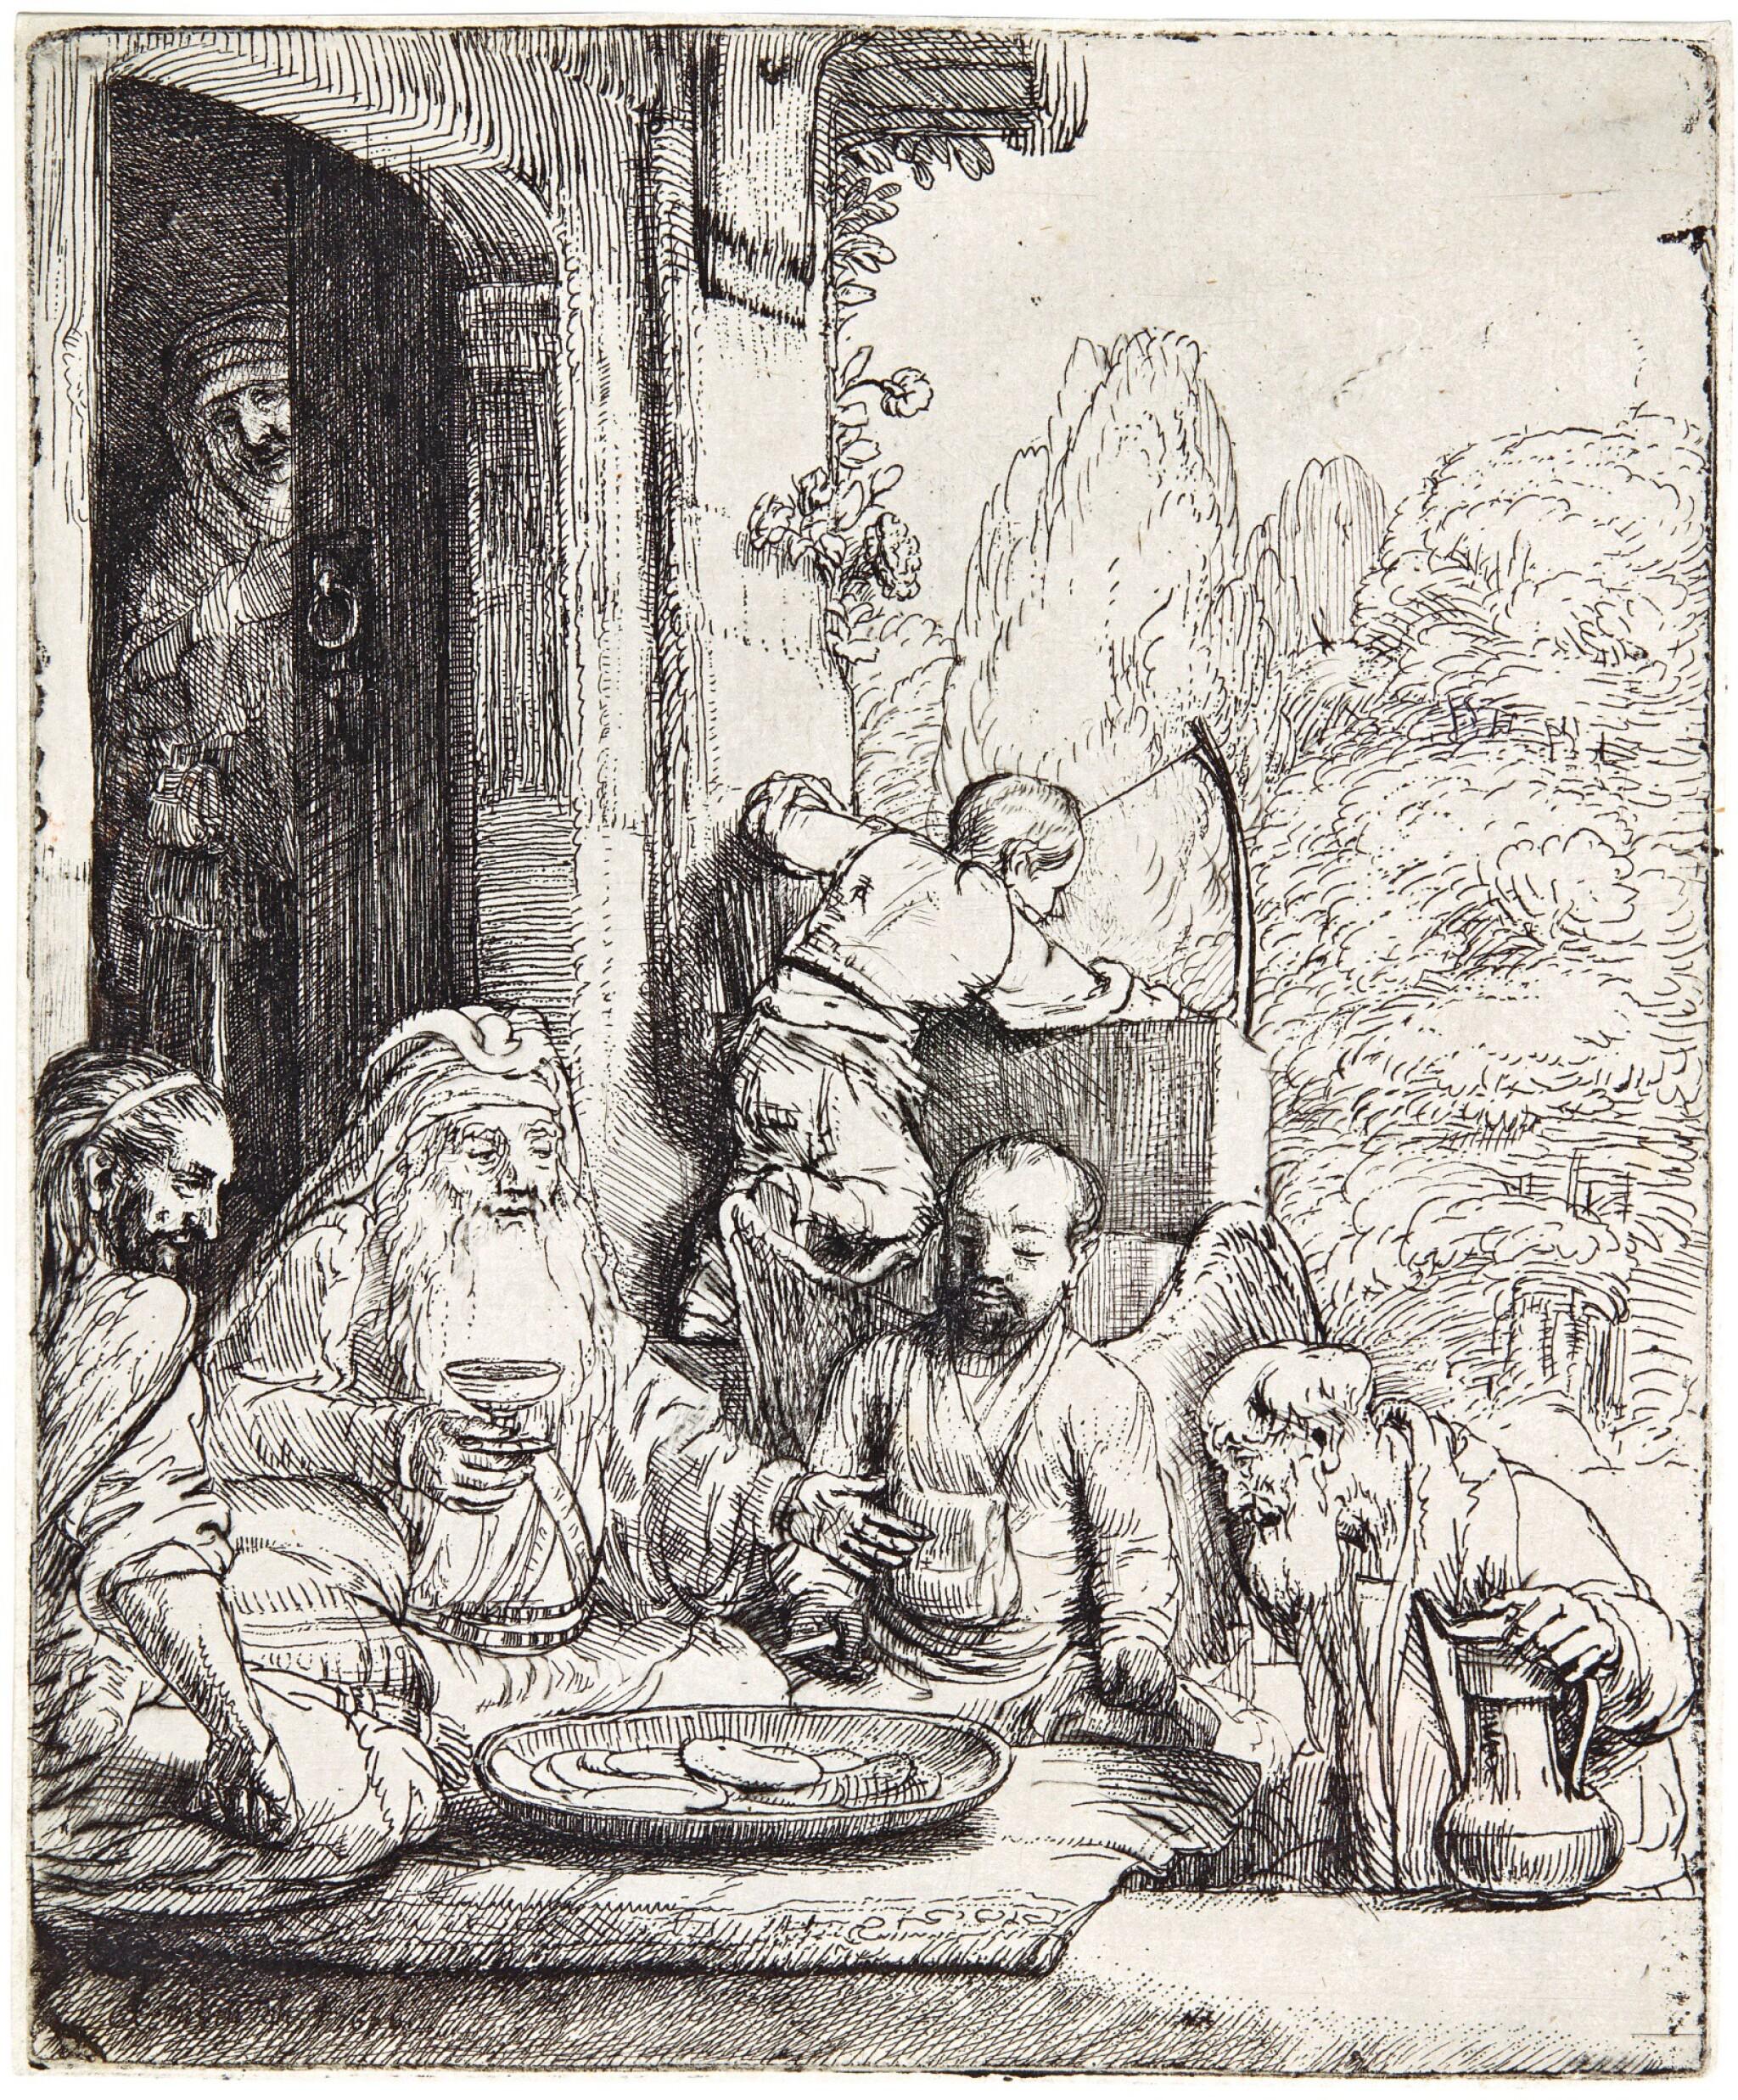 View 1 of Lot 57. REMBRANDT HARMENSZ. VAN RIJN | ABRAHAM ENTERTAINING THE ANGELS (B., HOLL. 29; NEW HOLL. 295; H. 286).